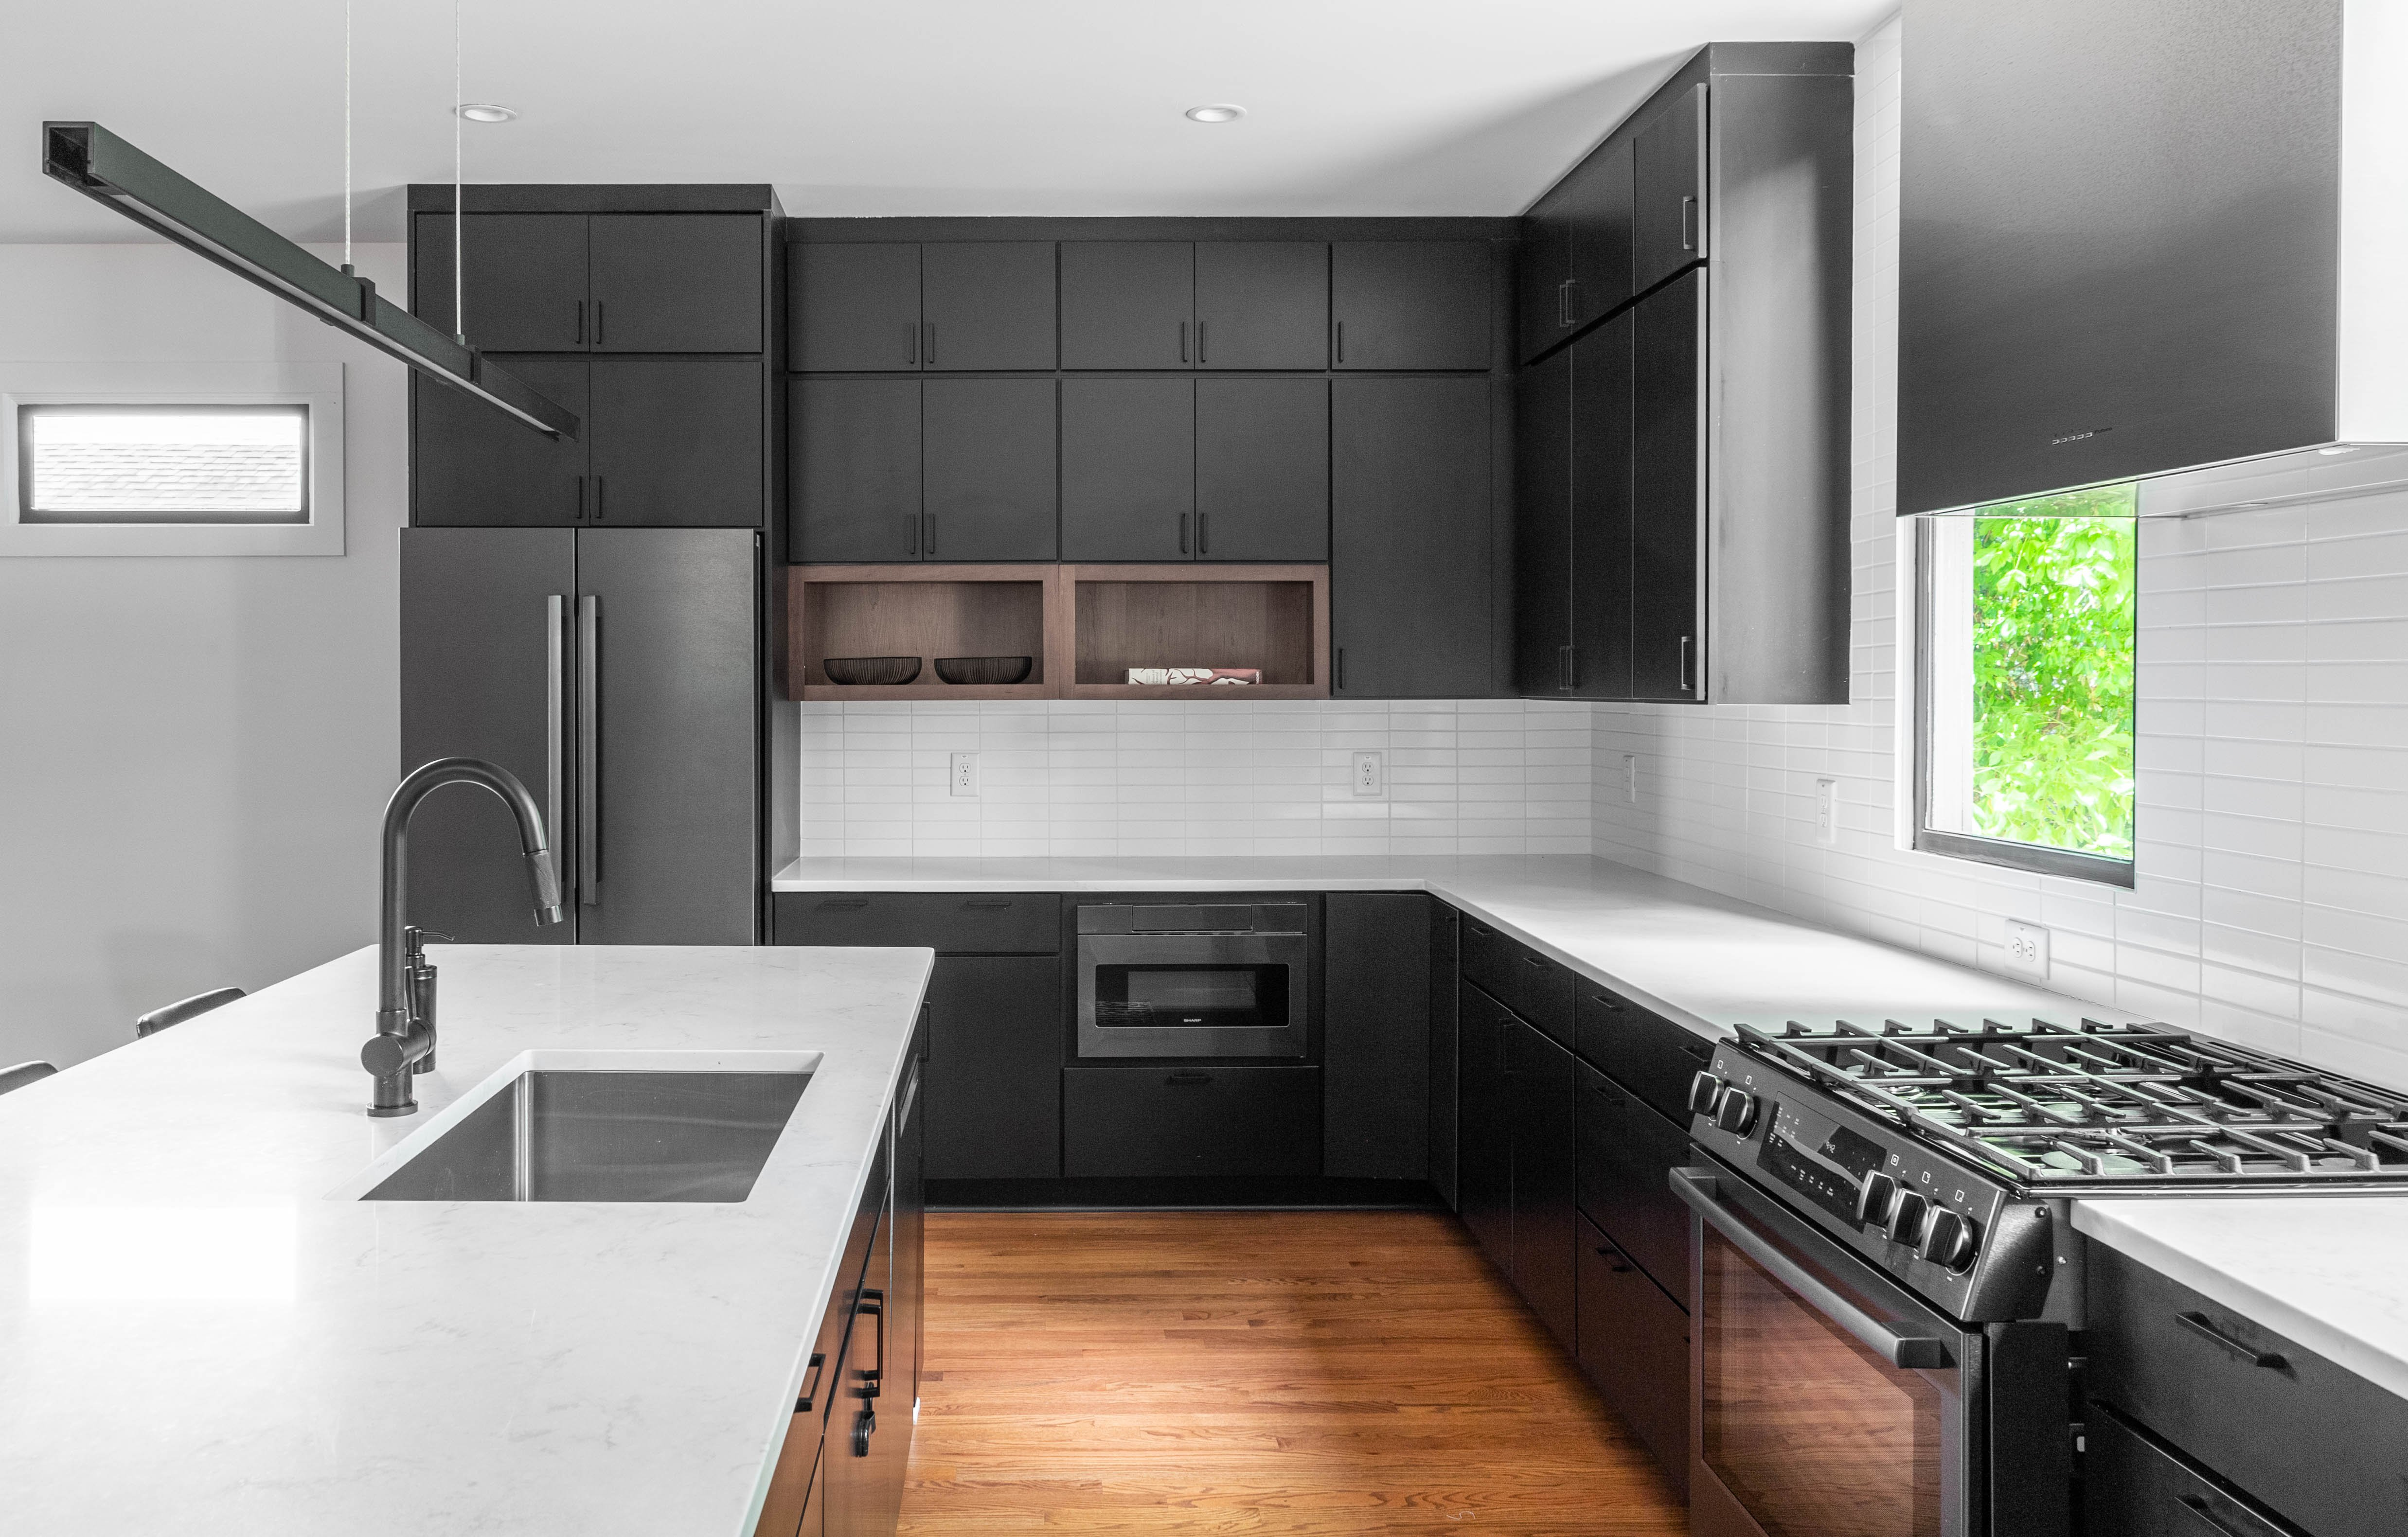 15 kitchen 20210707-IMG_7914-HDR.jpg